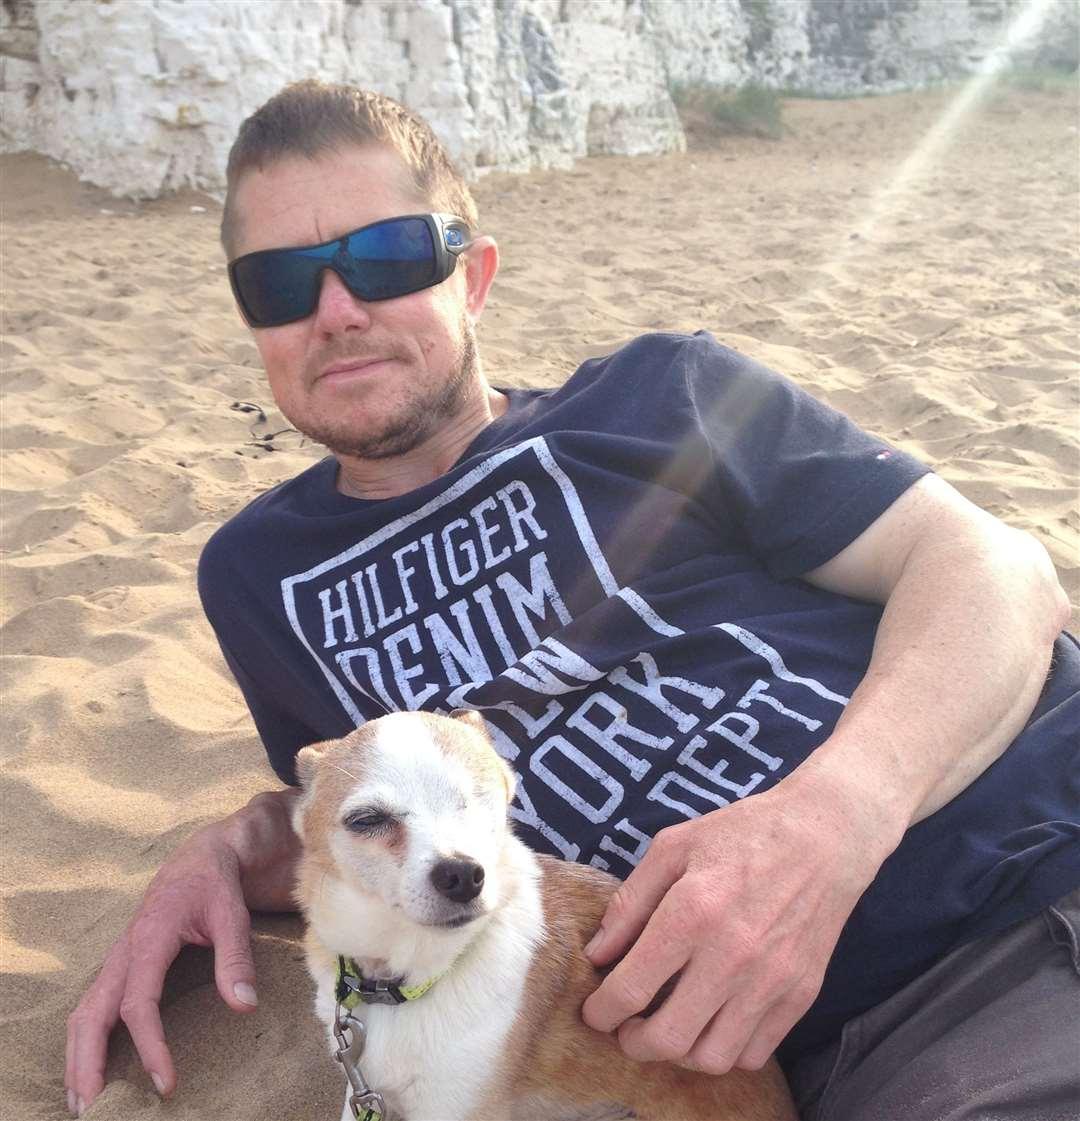 Rob Smith his dog 18-year-old dog Fifi